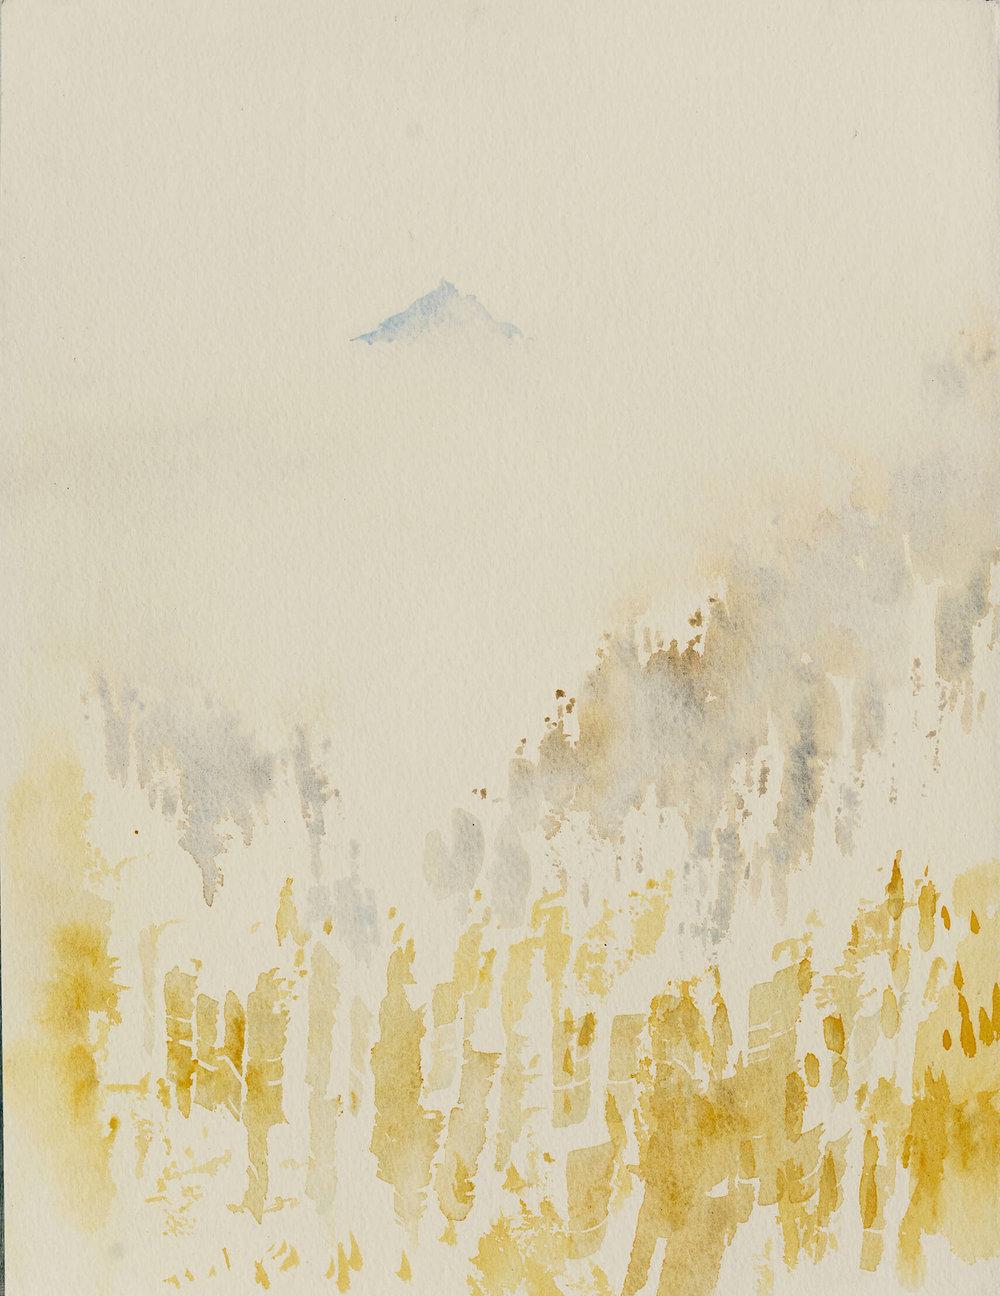 RHSK094 Ogura San Rising above Autumn Clouds ( Watercolour ) 36.8 x 28 cm